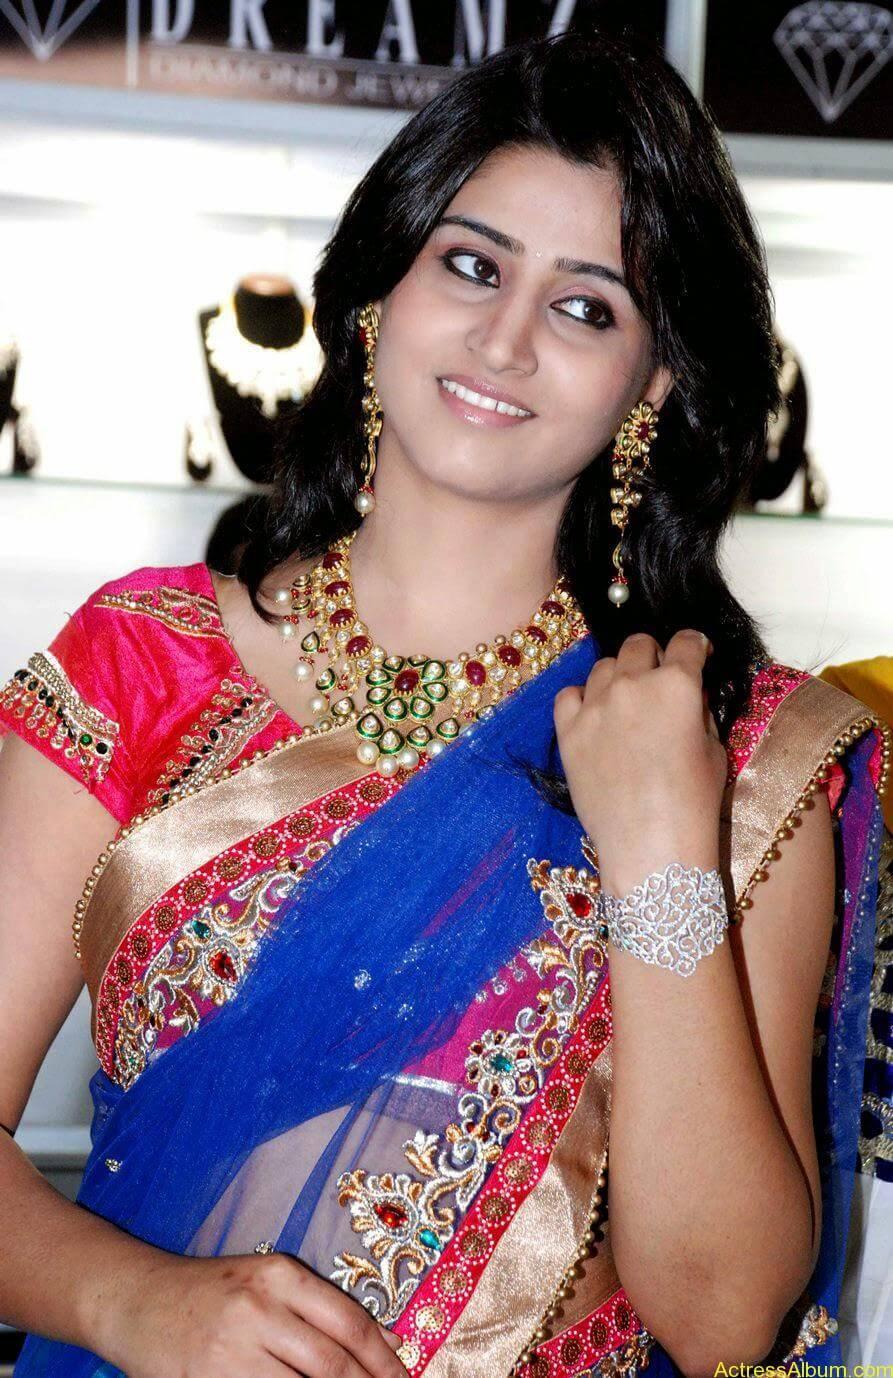 Shamli in saree at jewelry shop opening 6